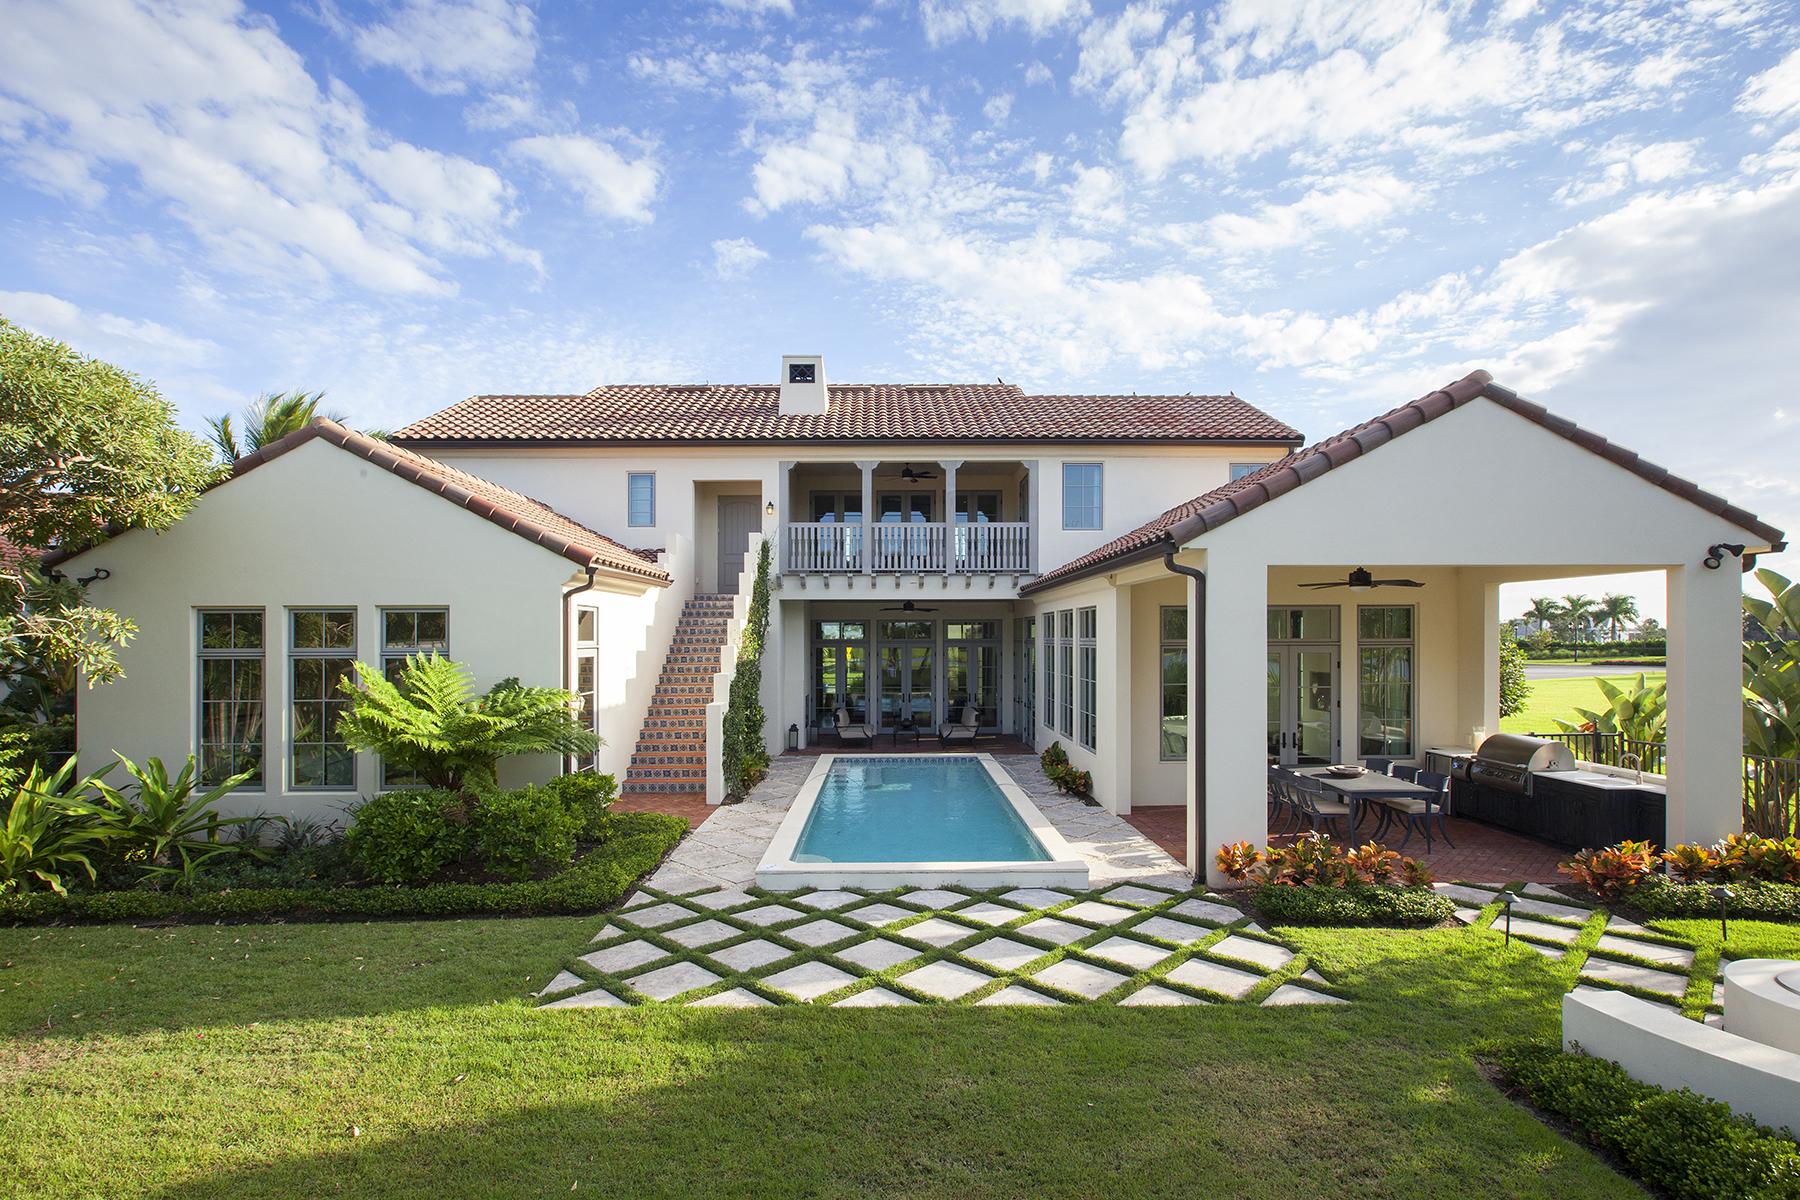 Single Family Home for Sale at FIDDLER'S CREEK - MARSH COVE 3259 Tavolara Ln Naples, Florida, 34114 United States